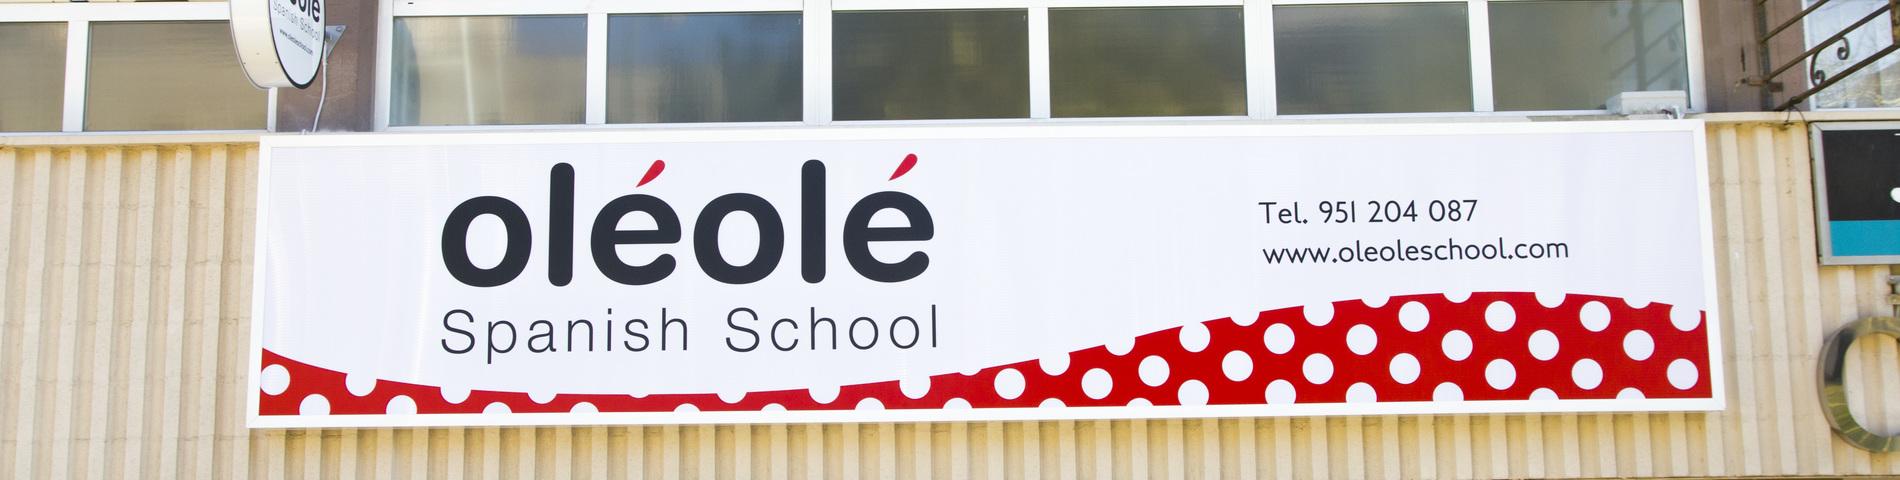 OléOlé Spanish School kép 1